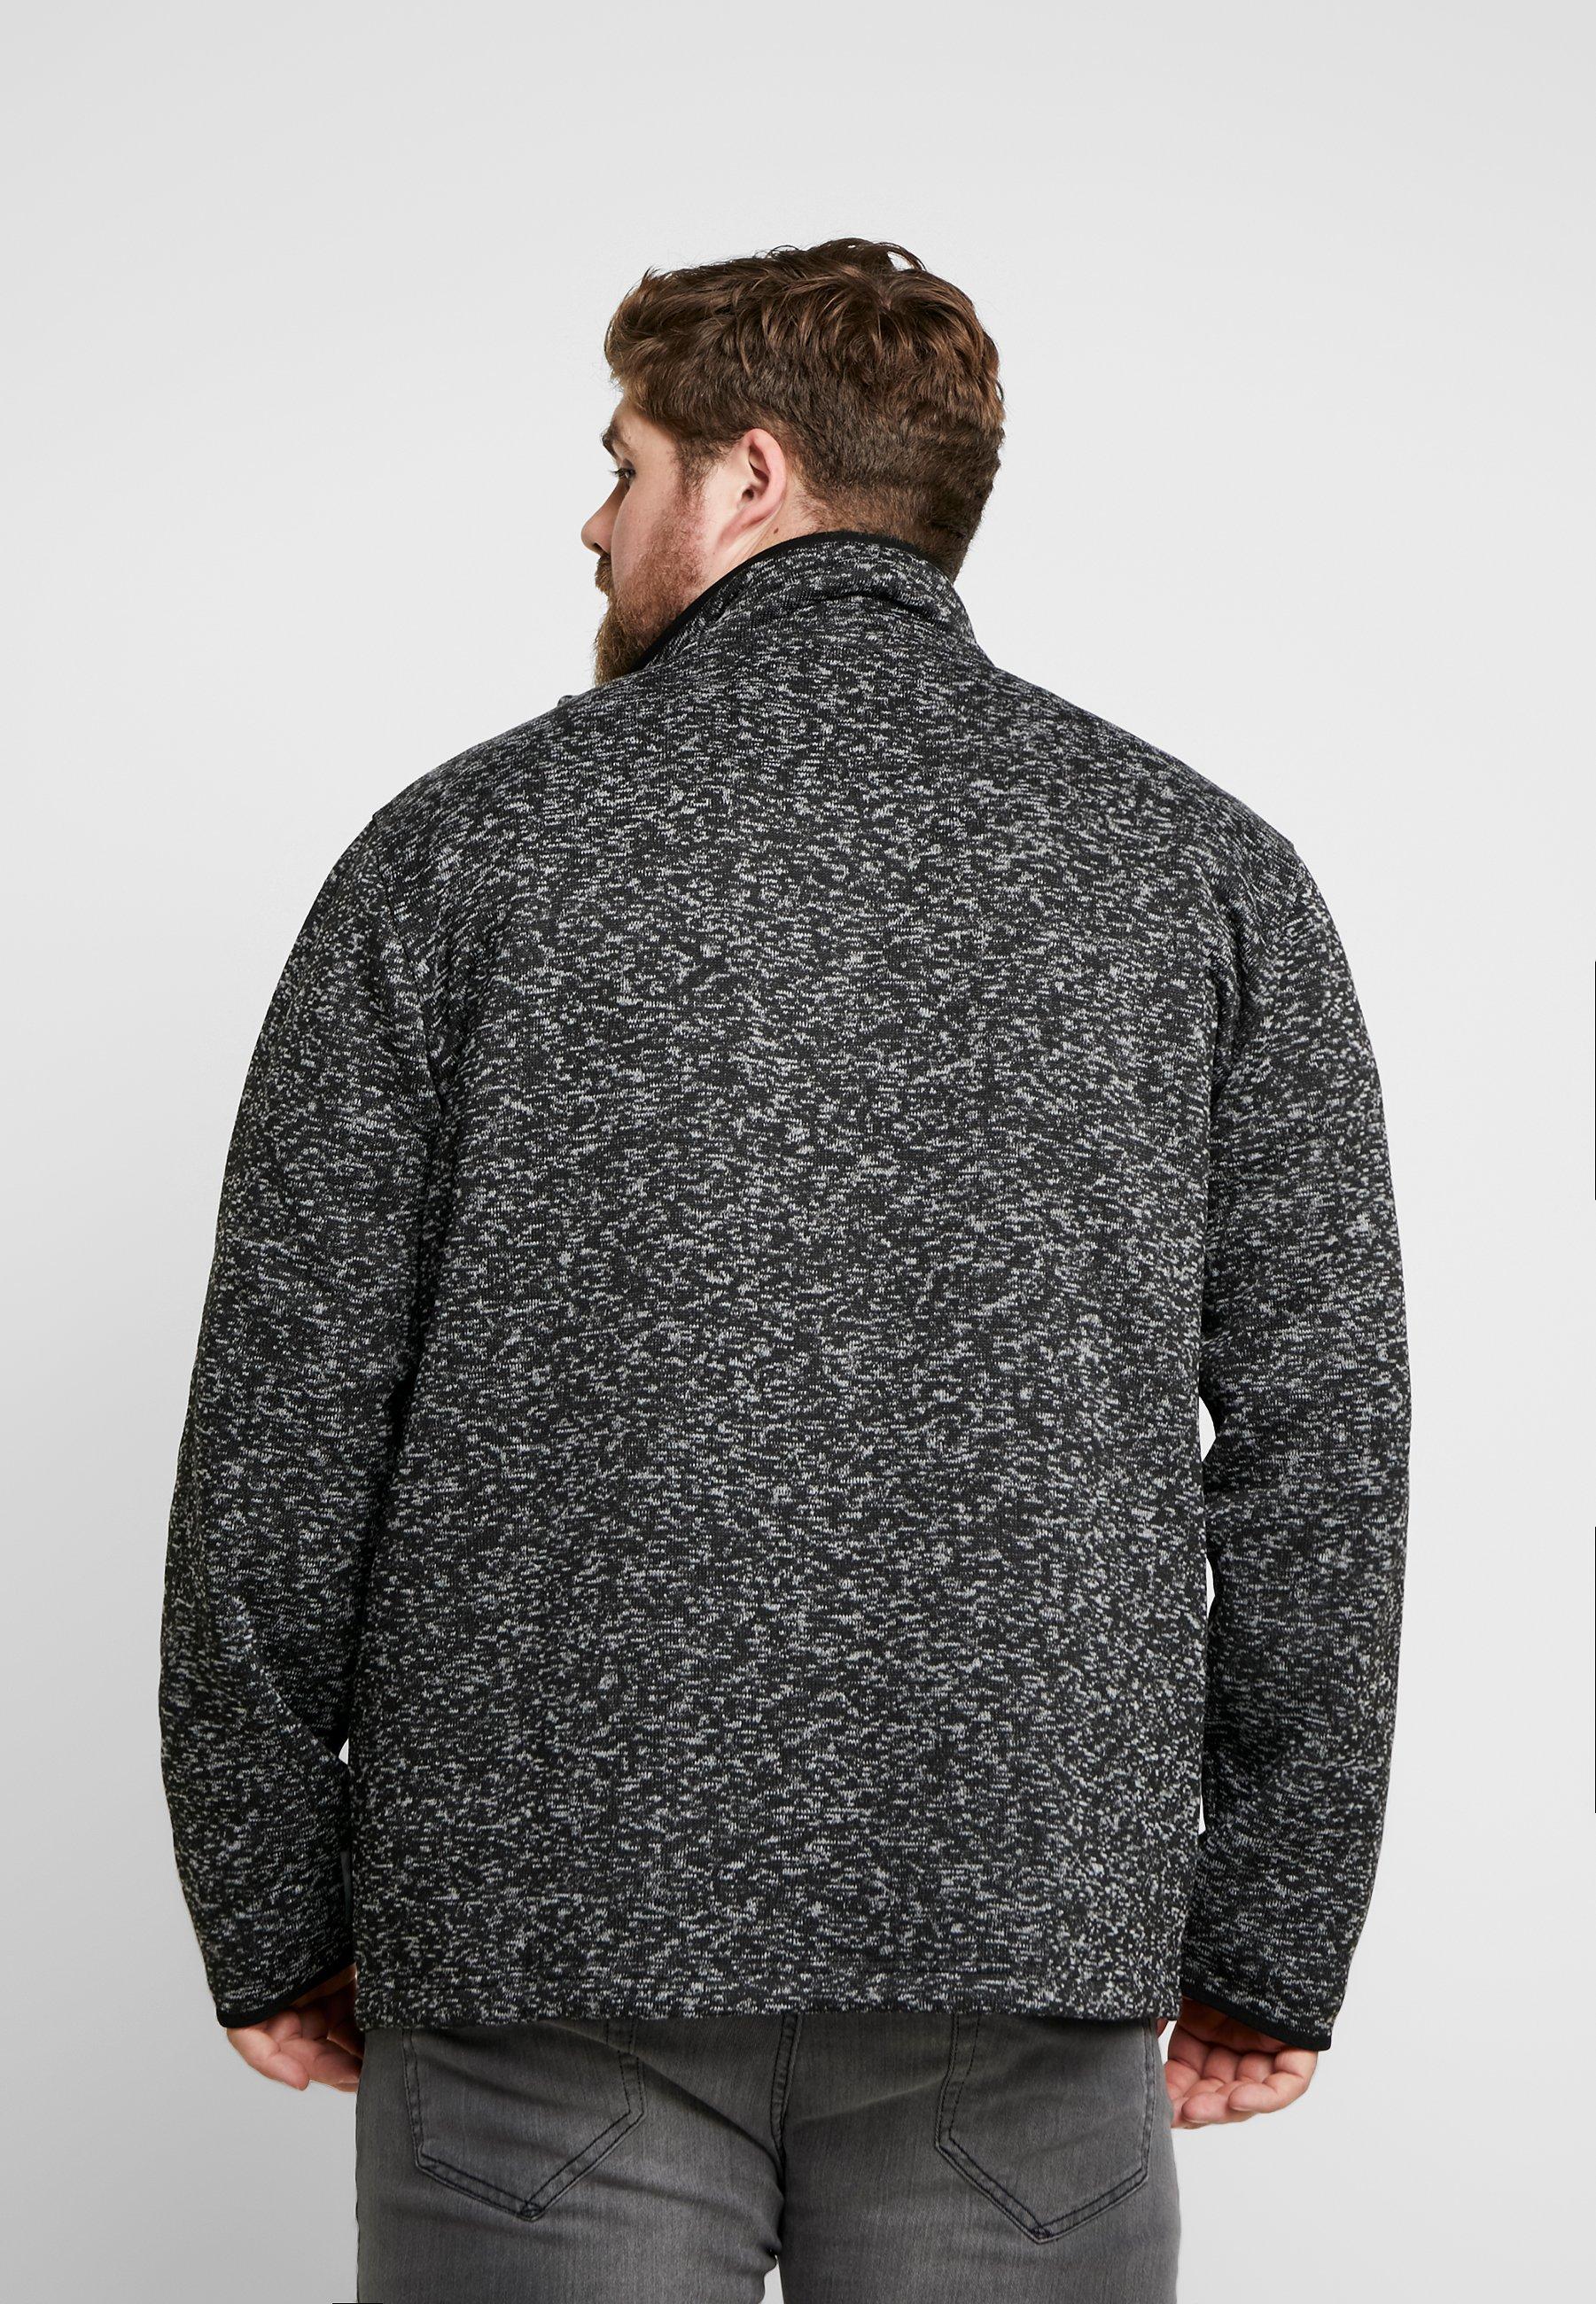 Sportswear Jack´s Outdoor Black Mix CardiganGiacca Leggera tCxhrsdQ